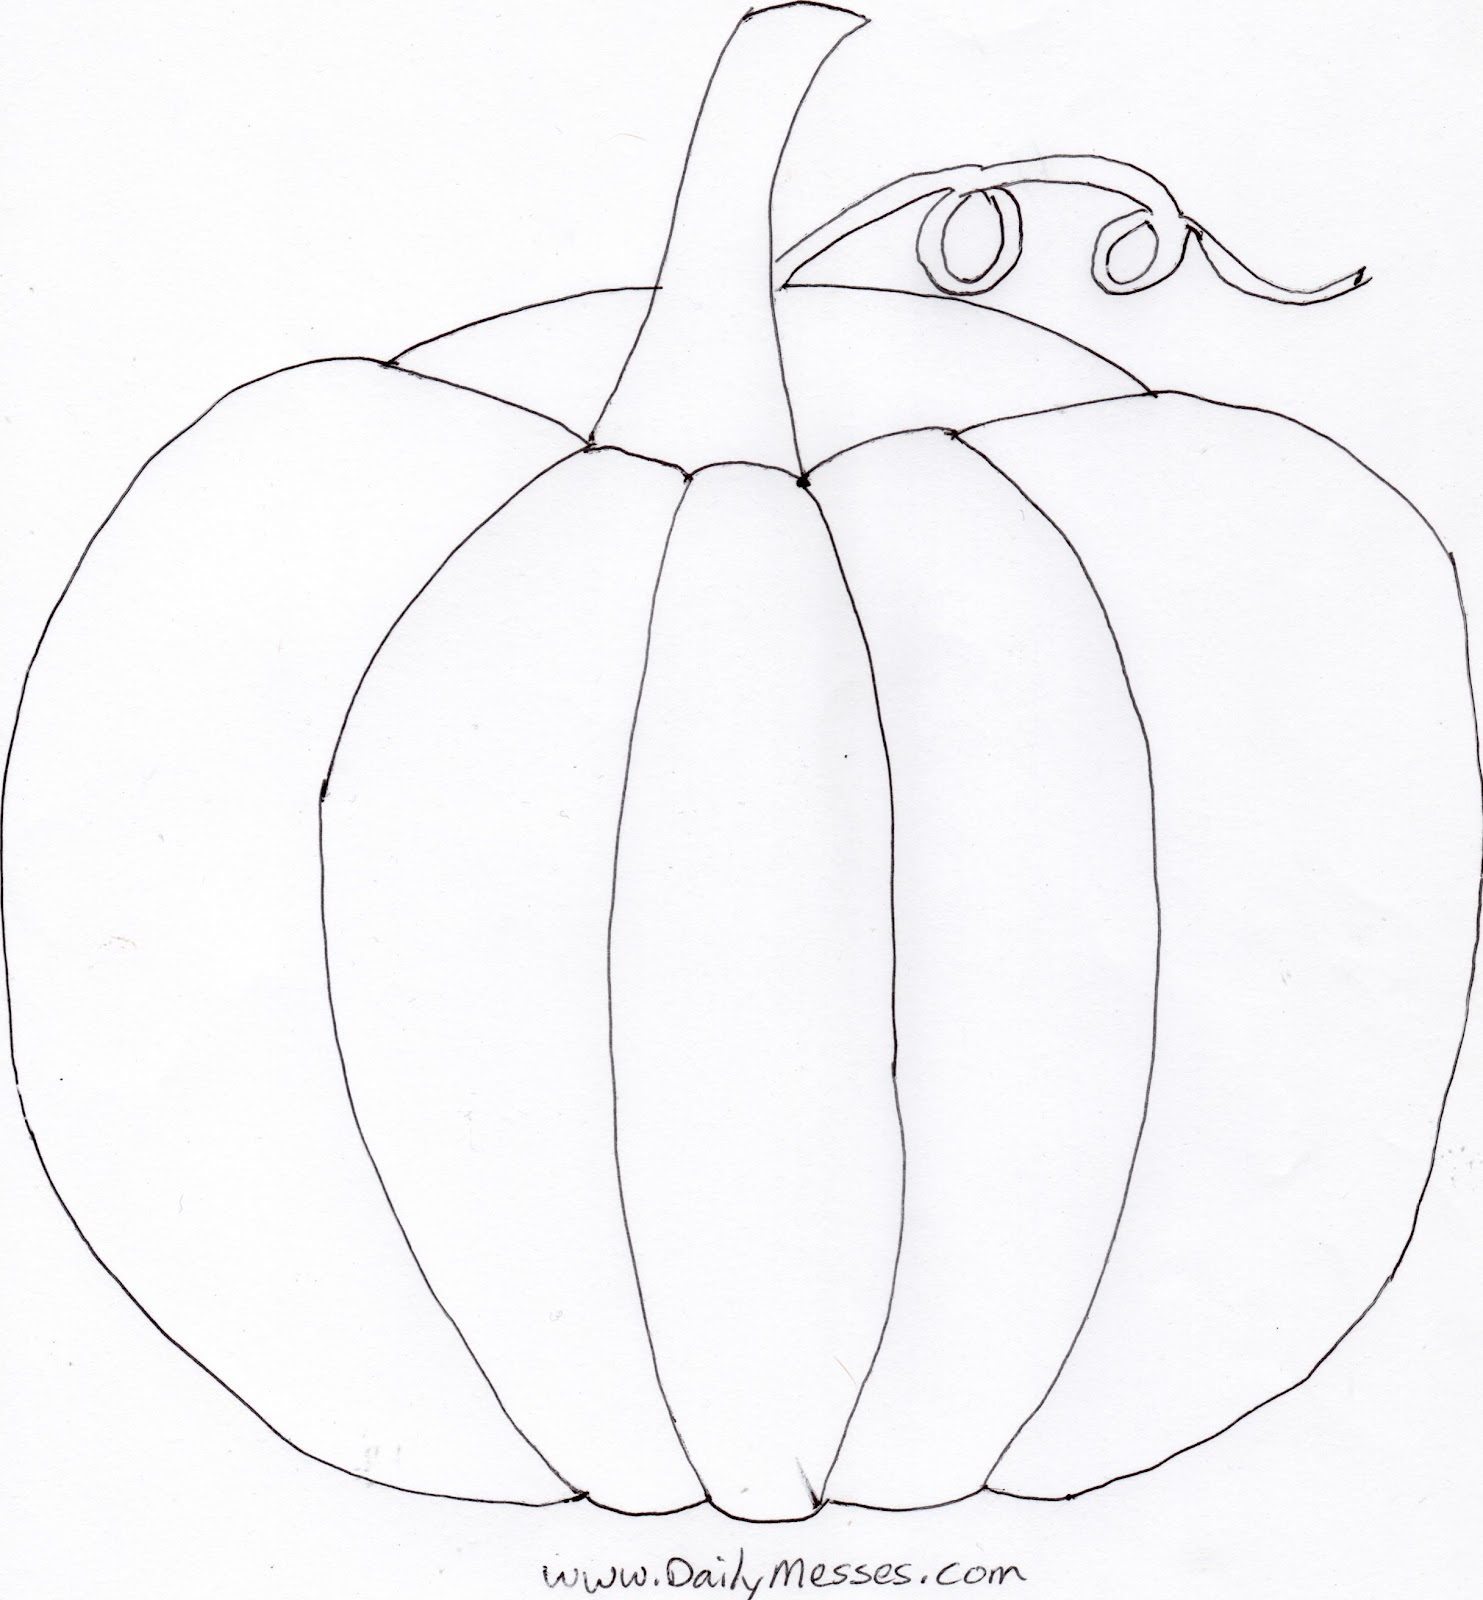 Daily Messes: Pumpkin Alternatives